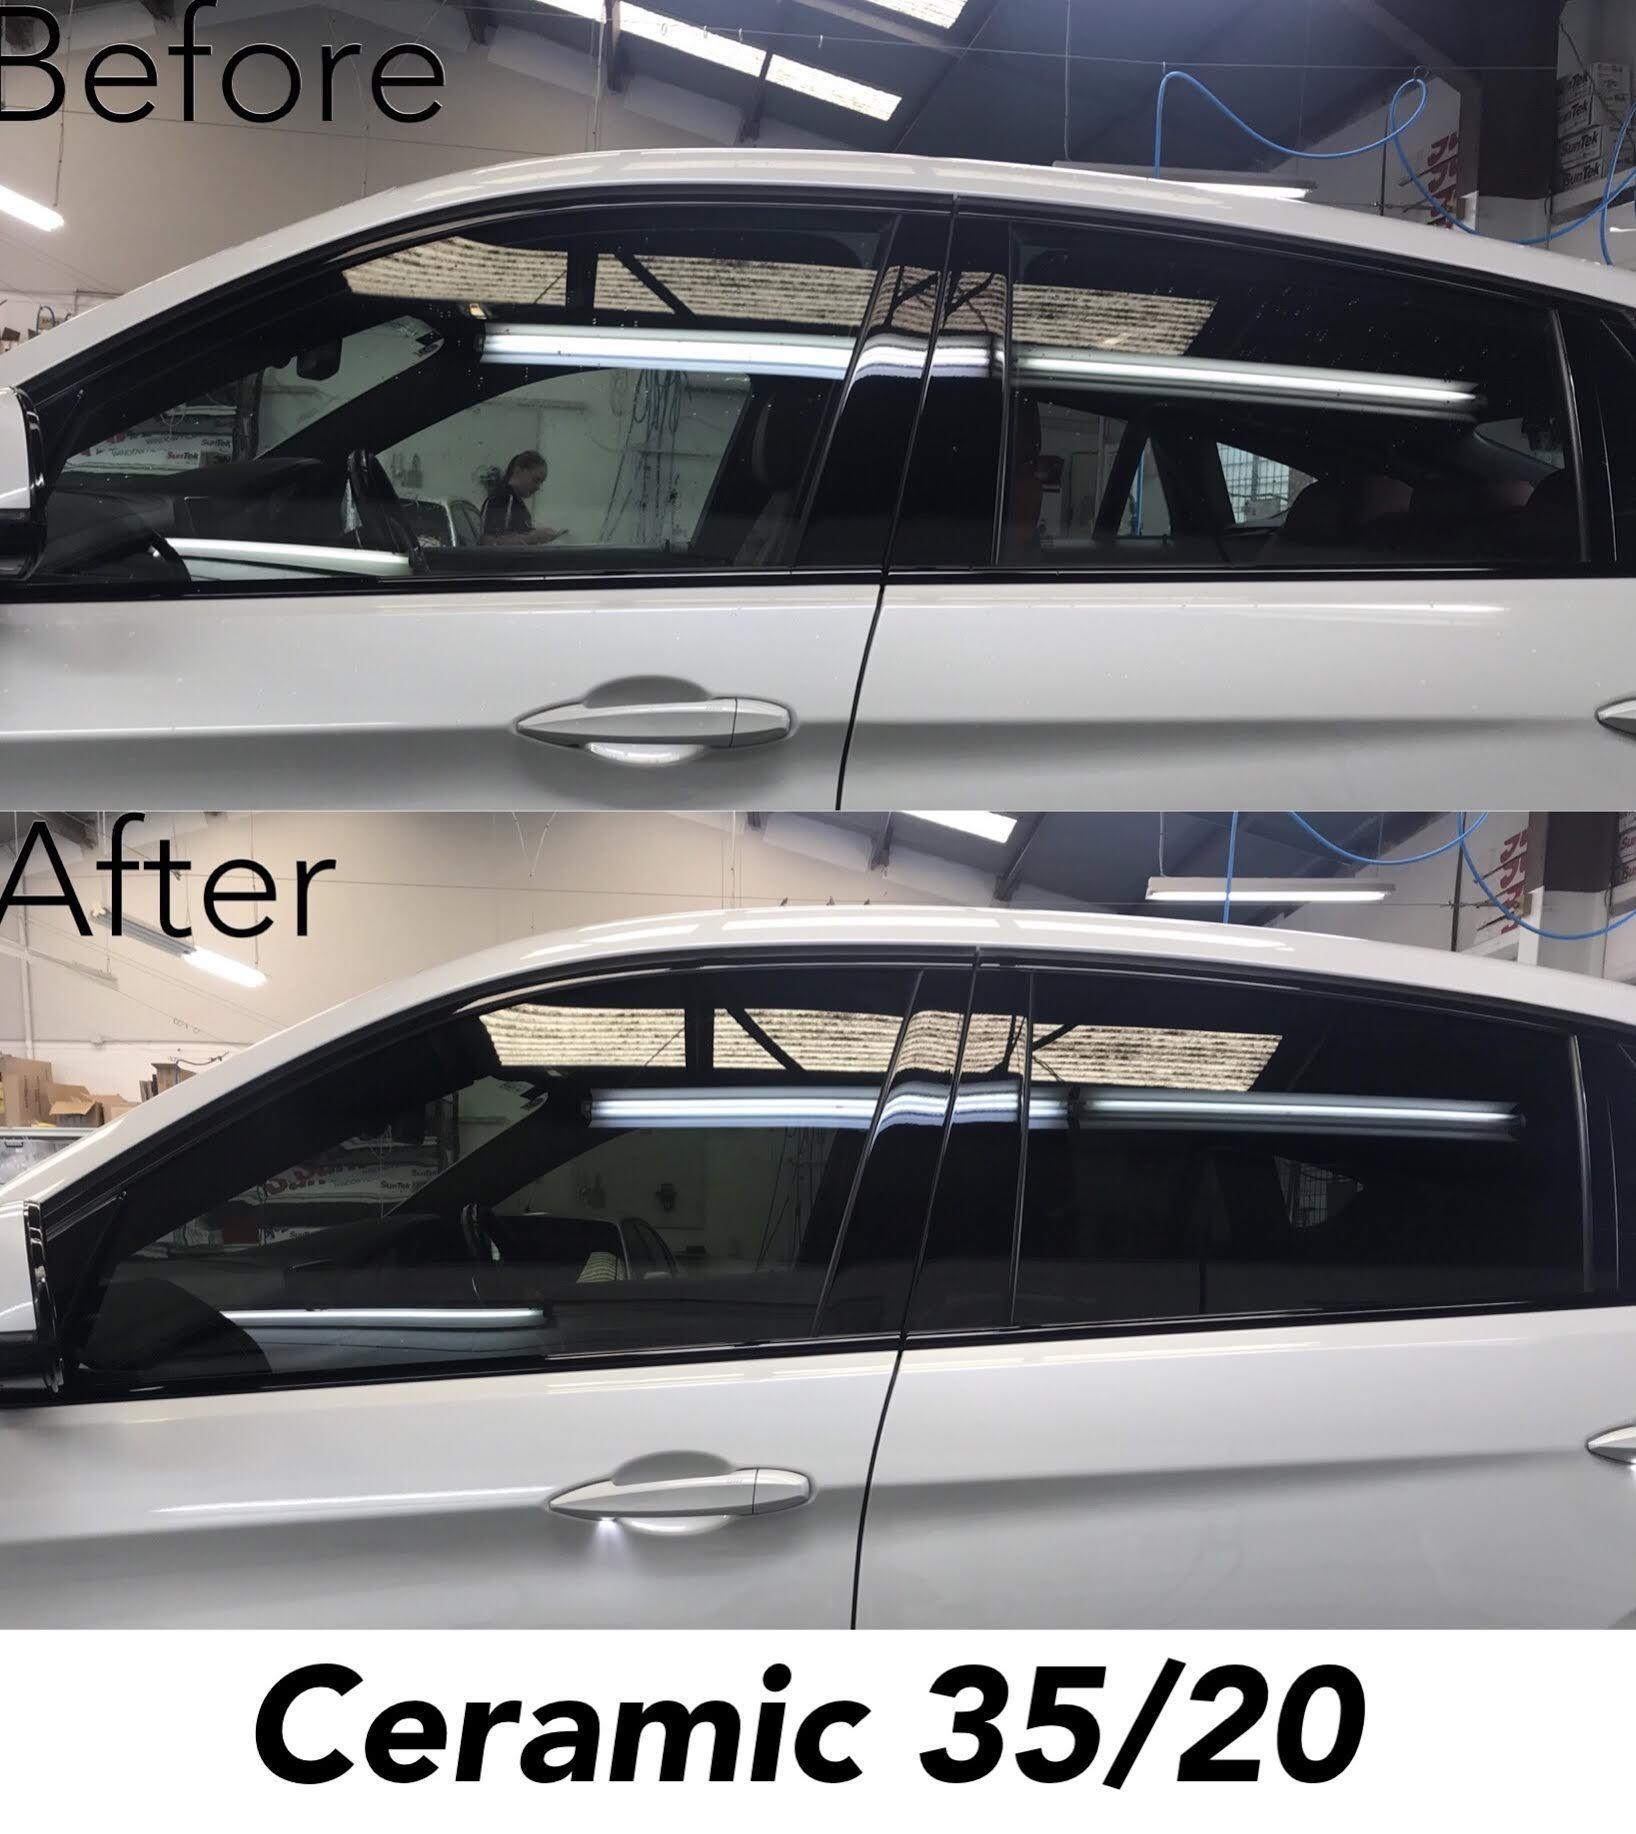 Automotive Gallery Window Tinting Raleigh Cary Apex Tinted Windows Chevrolet Camaro Automotive